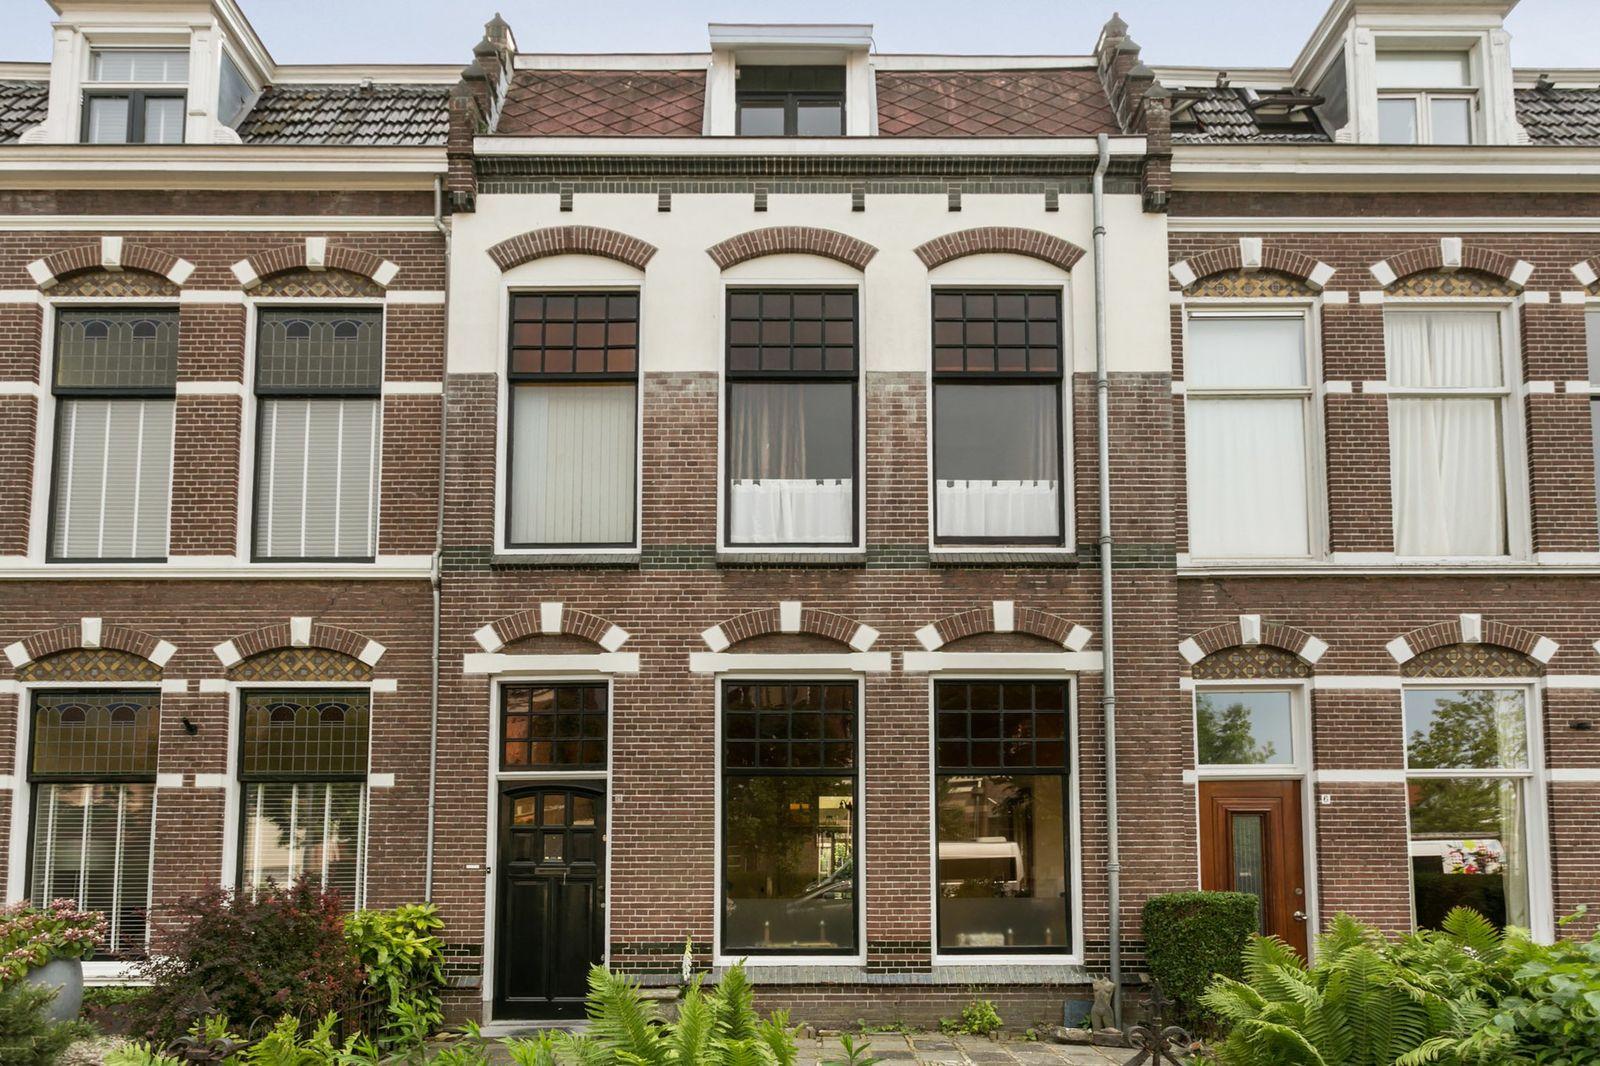 Johan Willem Frisostraat 8, Leeuwarden